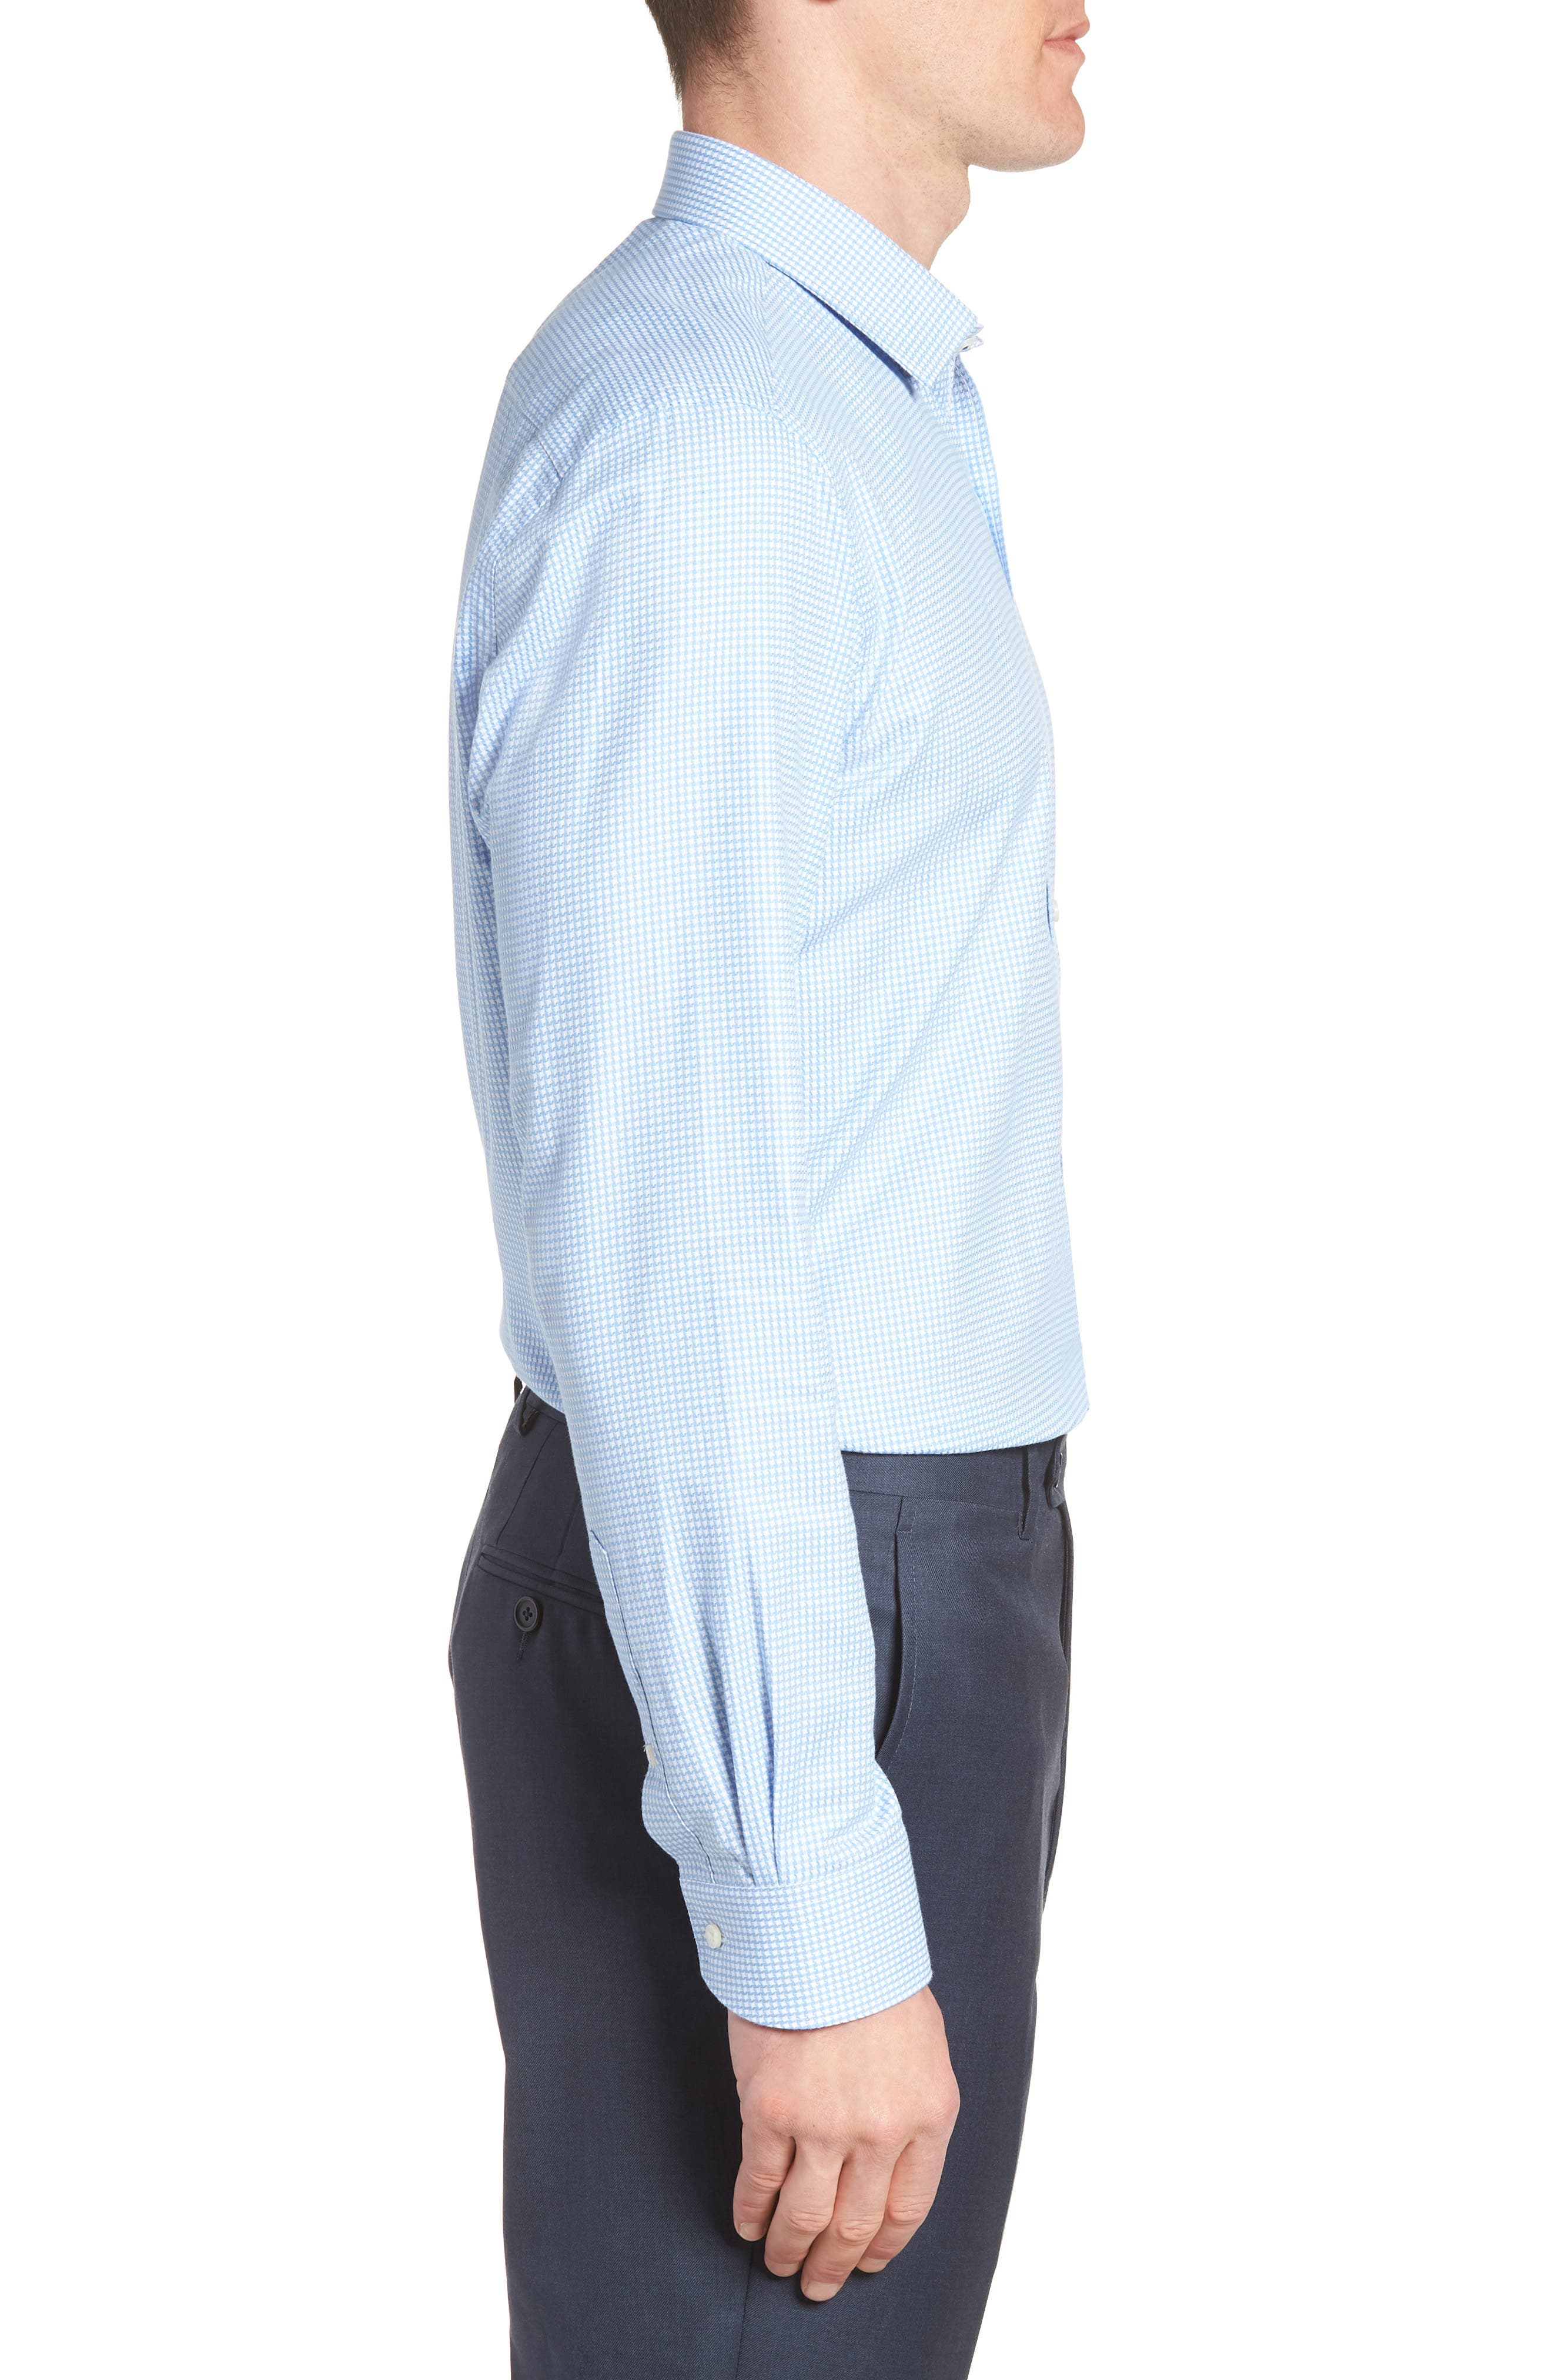 Jaiden Trim Fit Houndstooth Dress Shirt,                             Alternate thumbnail 4, color,                             450